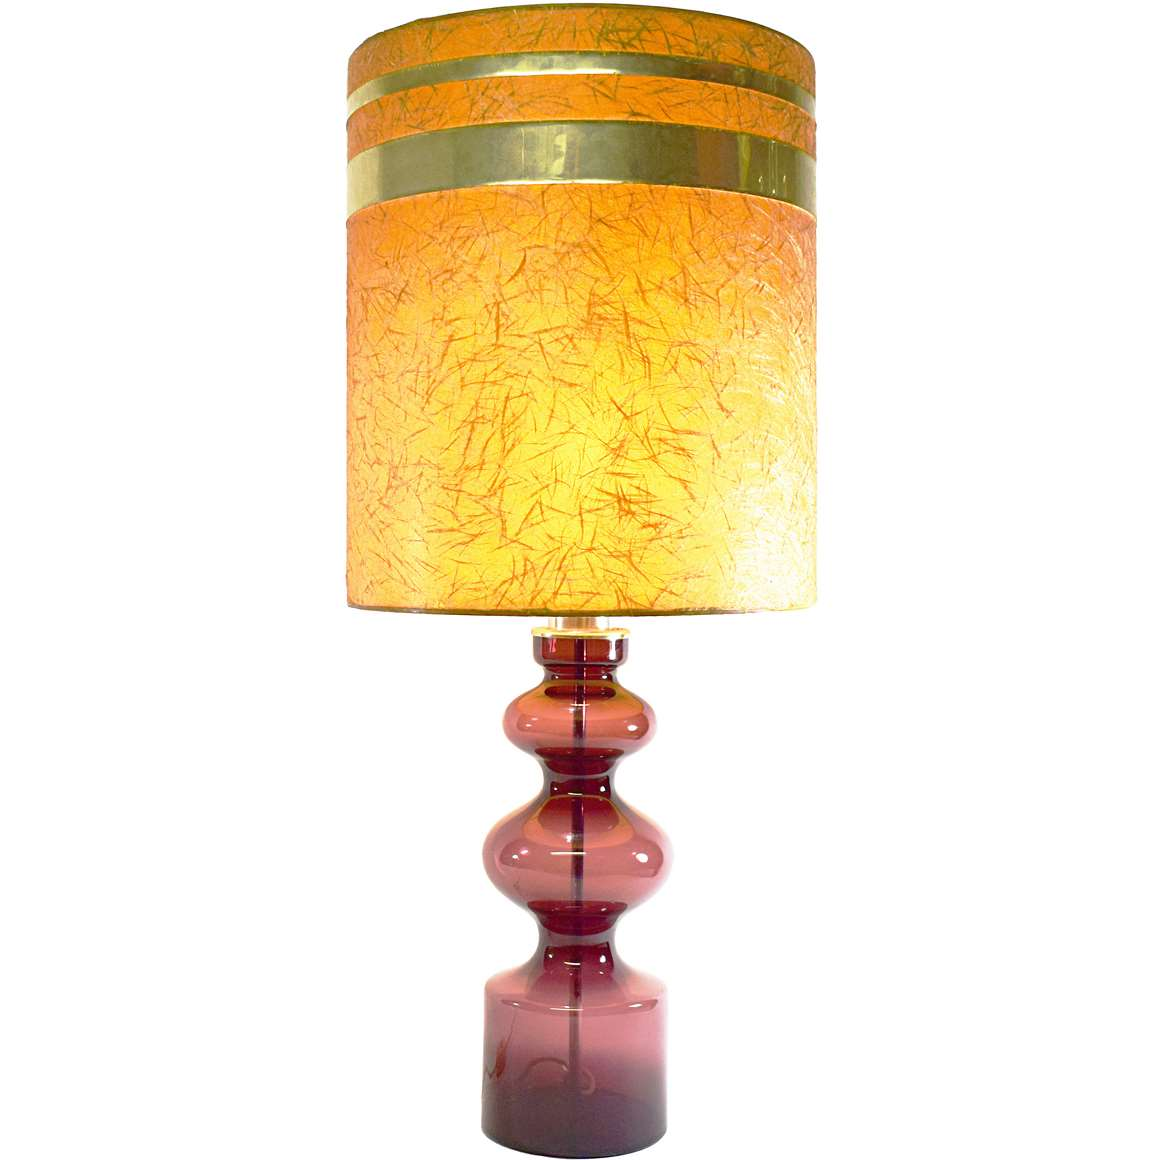 Aubergine table lamp lamp ideas cash vs credit aubergine table lamps nestify geotapseo Choice Image